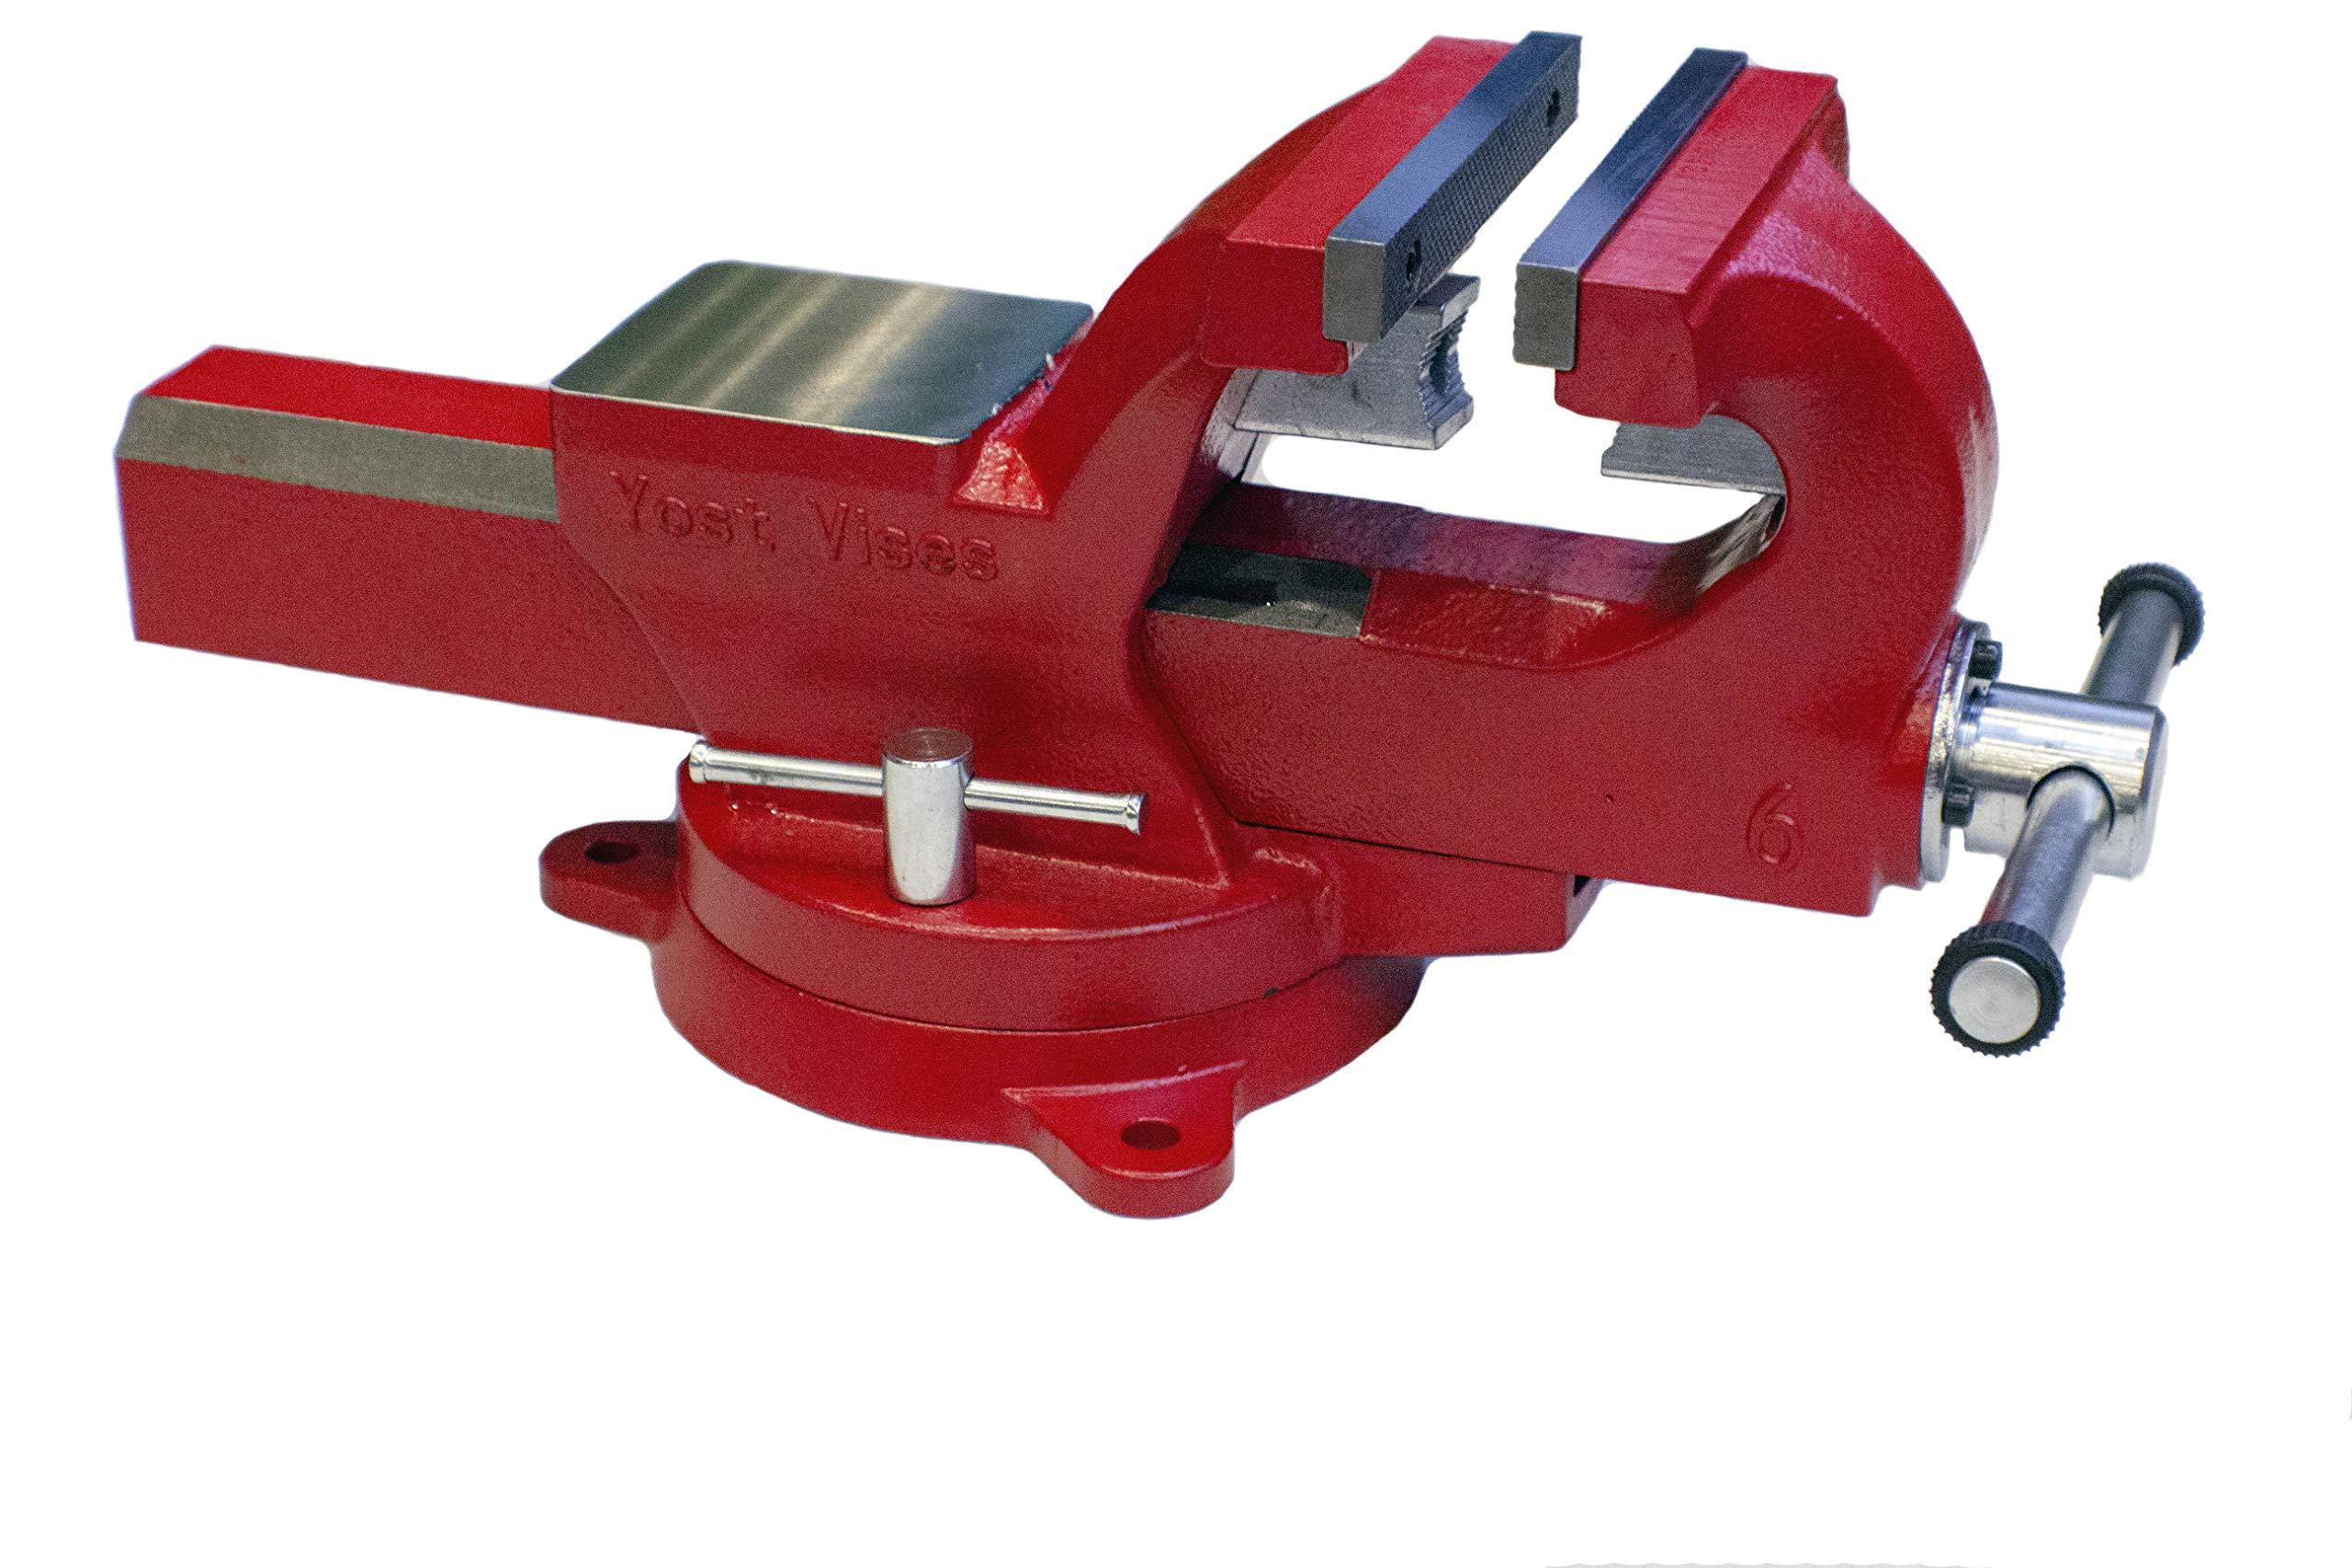 Yost Vises ADI-8, 8 Inch 130,000 PSI Austempered Ductile Iron Bench Vise with 360-Degree Swivel Base superseding Yost FSV-7